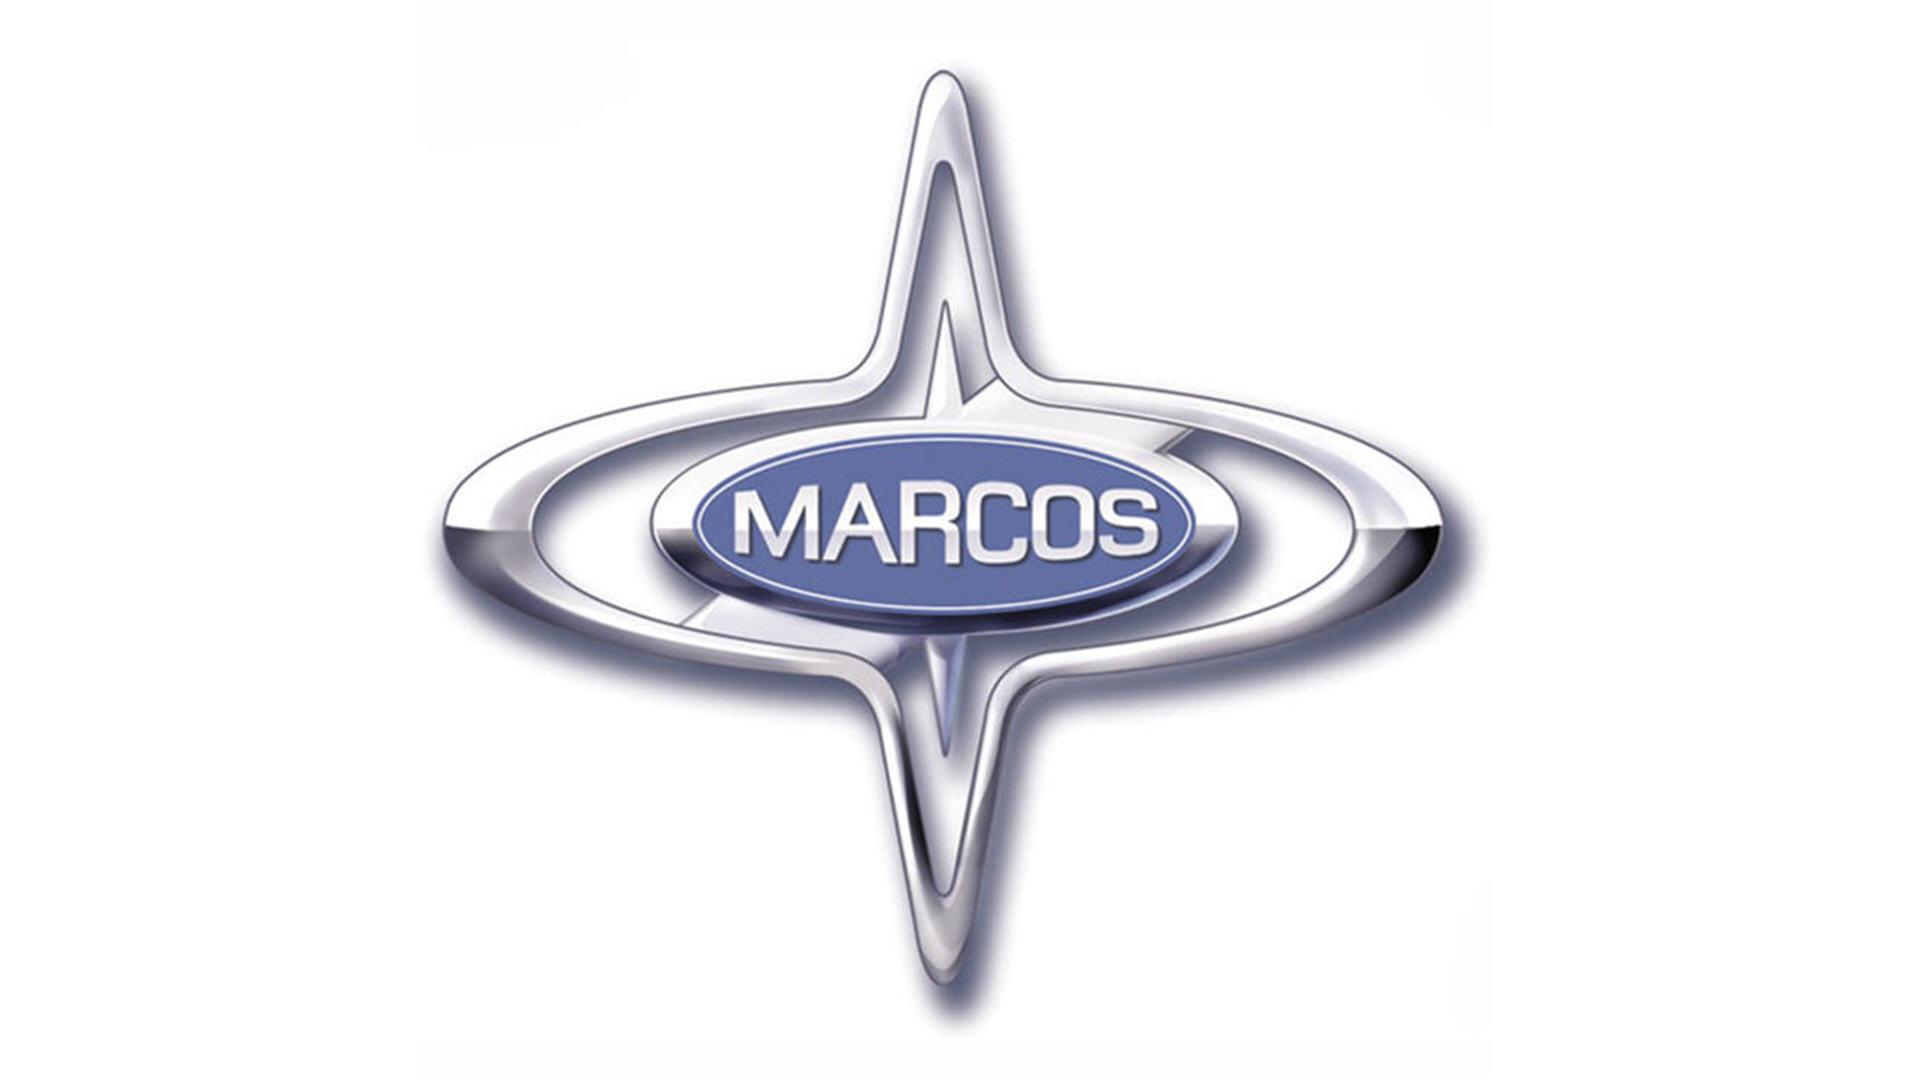 Marcos logo wallpapers HD